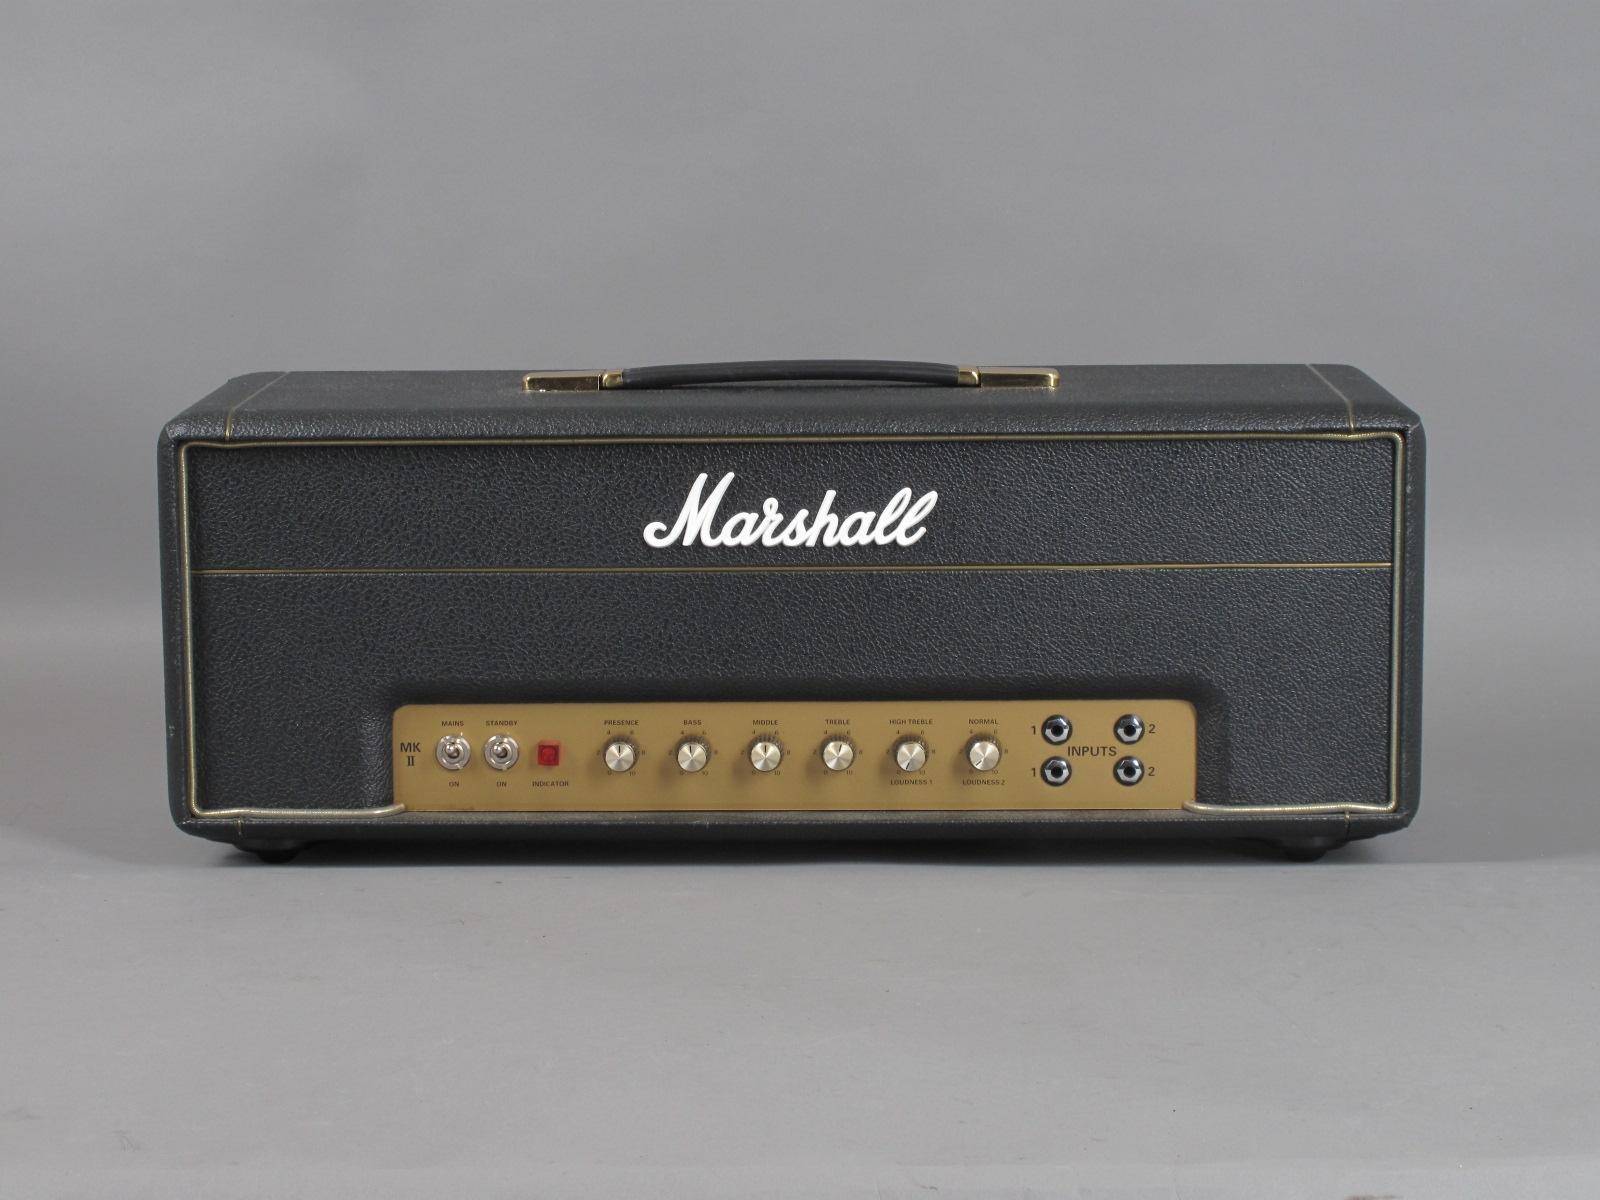 2002 Marshall 1987X MK2 - 50 Watt Plexi Reissue